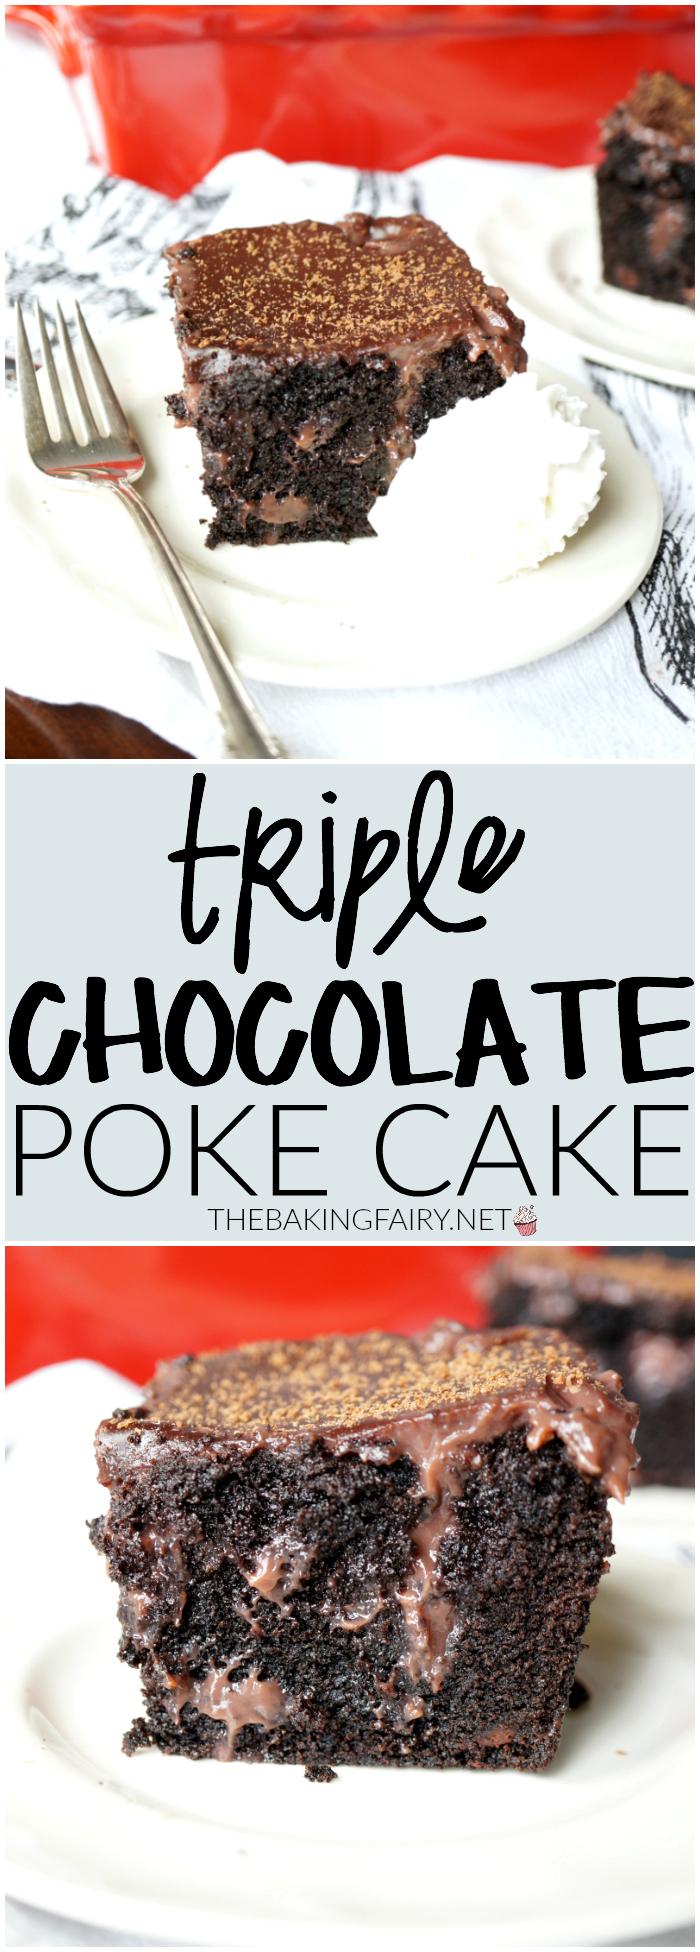 triple chocolate poke cake | The Baking Fairy